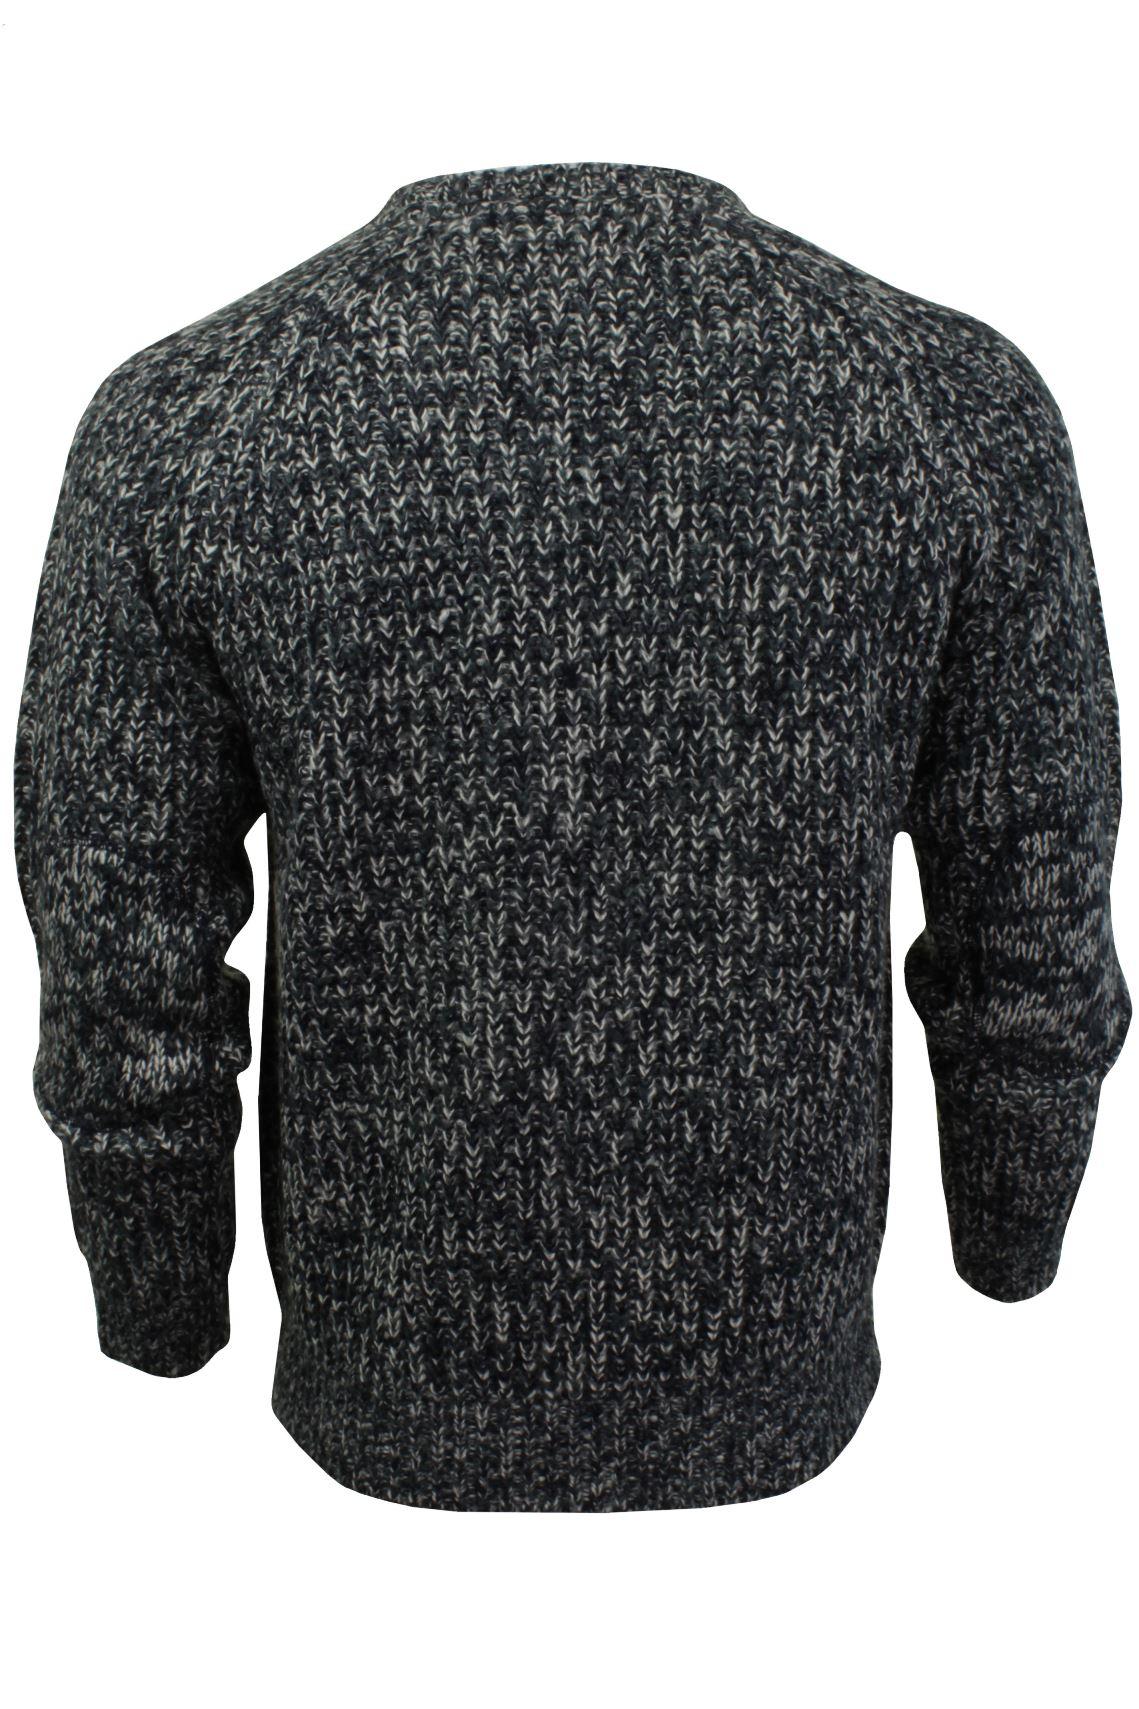 Xact-Mens-Jumper-Fashion-Chunky-Fisherman-Fleck-Knit-Long-Sleeve thumbnail 9